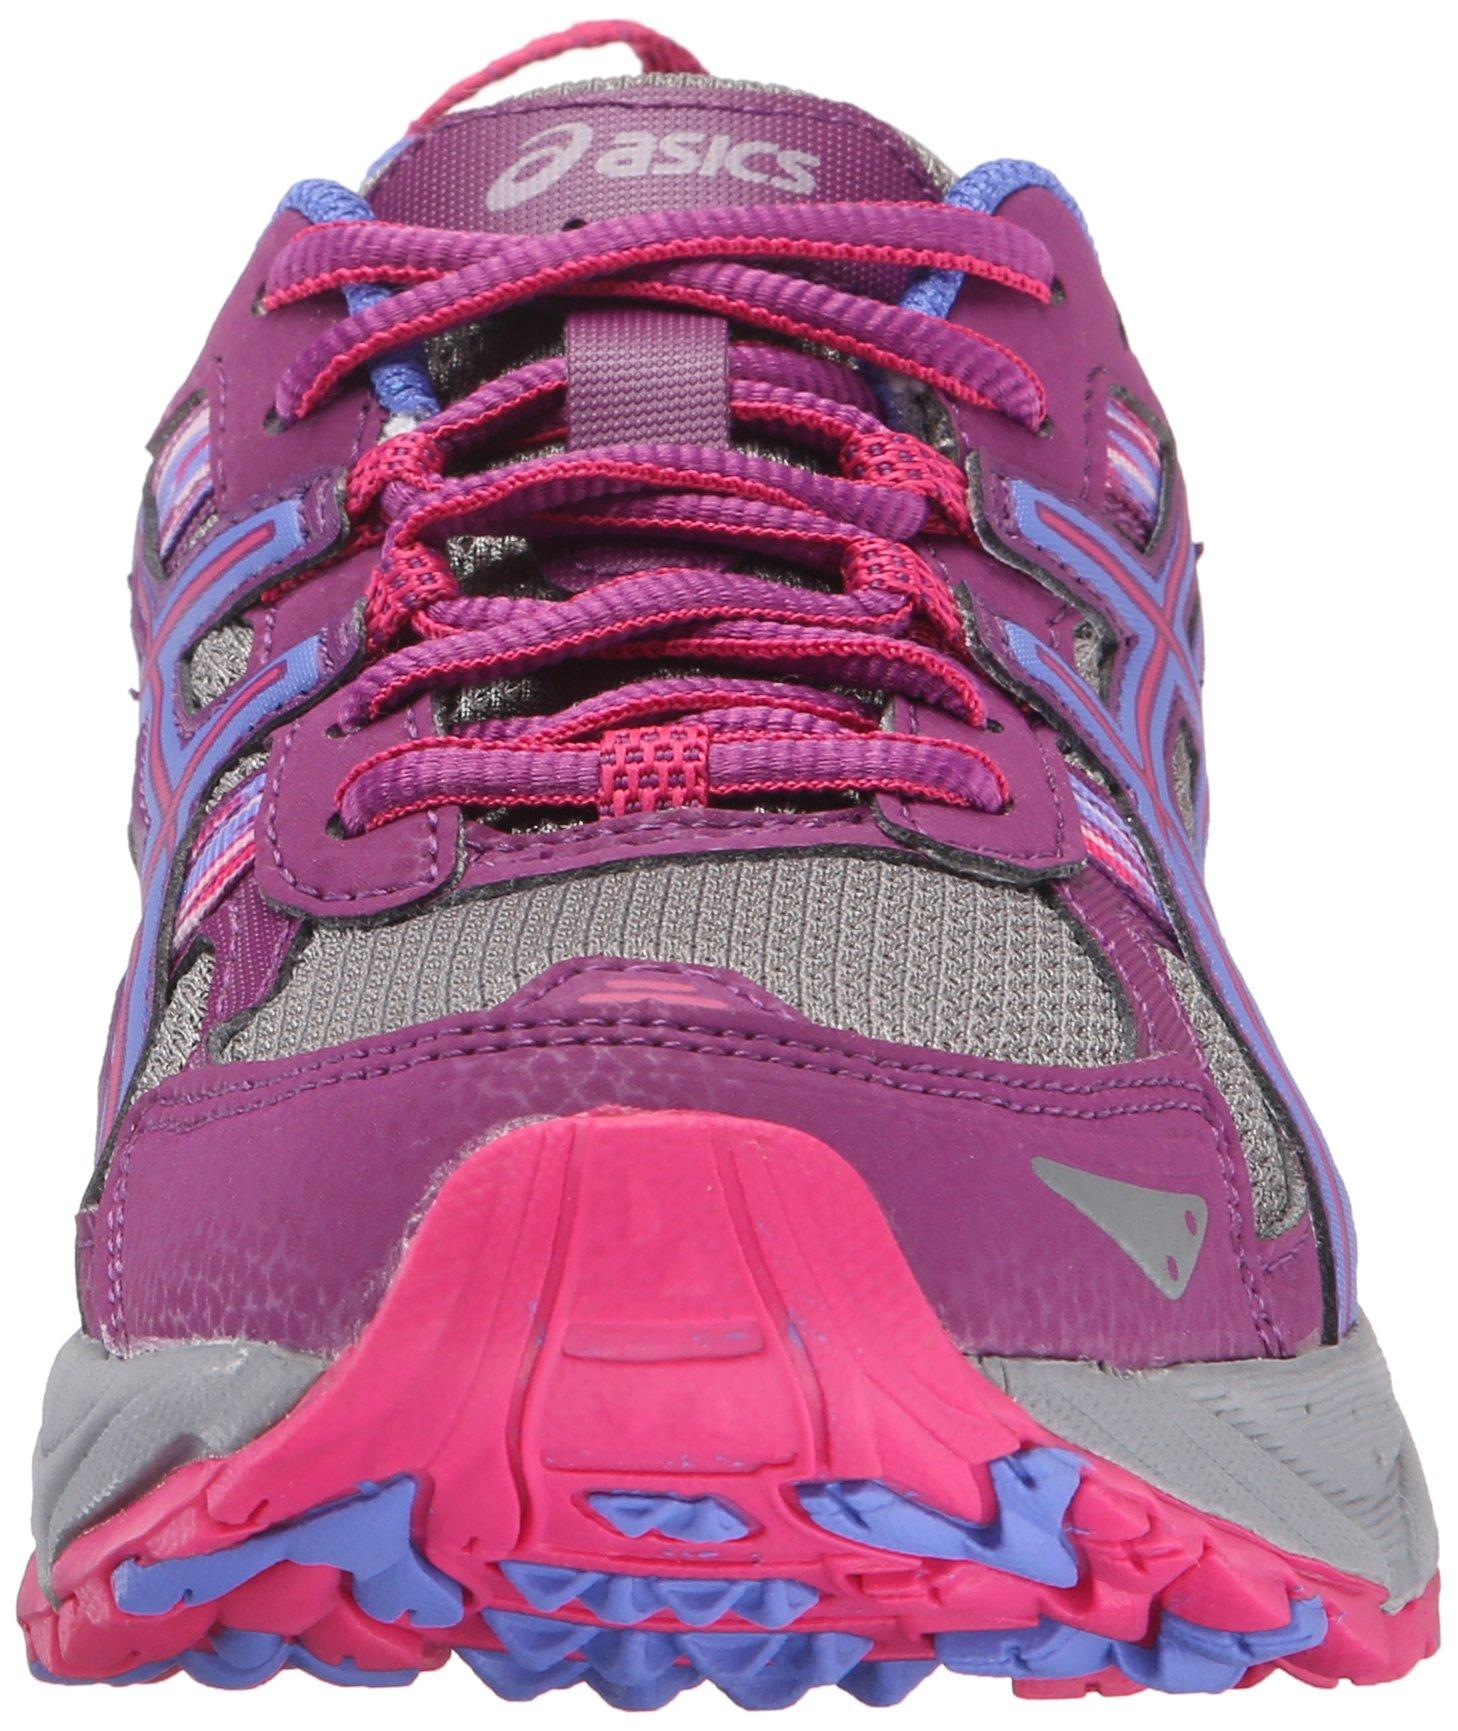 ASICS Women's Gel-Venture 5 Trail Runner, Phlox/Sport Pink/Aluminum, 6 M US by ASICS (Image #4)